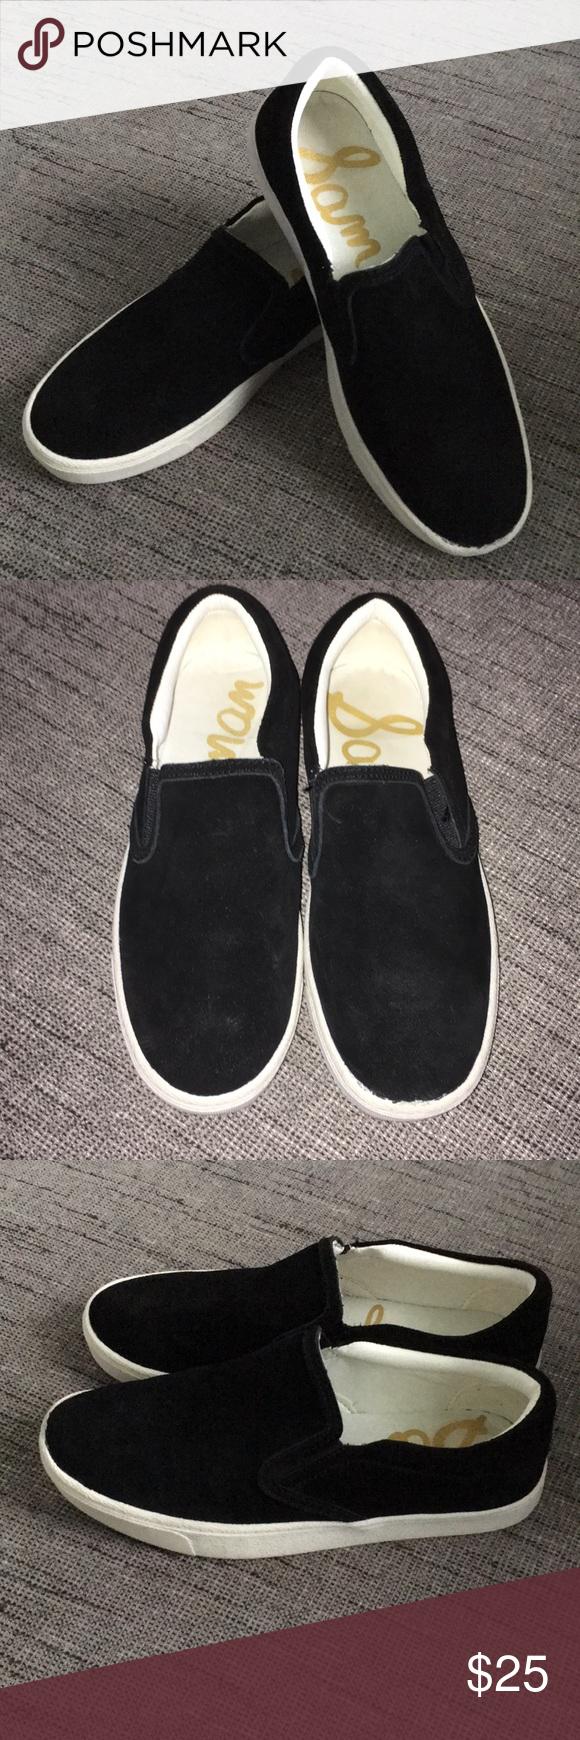 d034e2ada Sam Edelman Marvin Black Suede Slip on Sneakers 6 Sam Edelman Marvin black  suede slip on sneakers. Size 6 Sam Edelman Shoes Sneakers